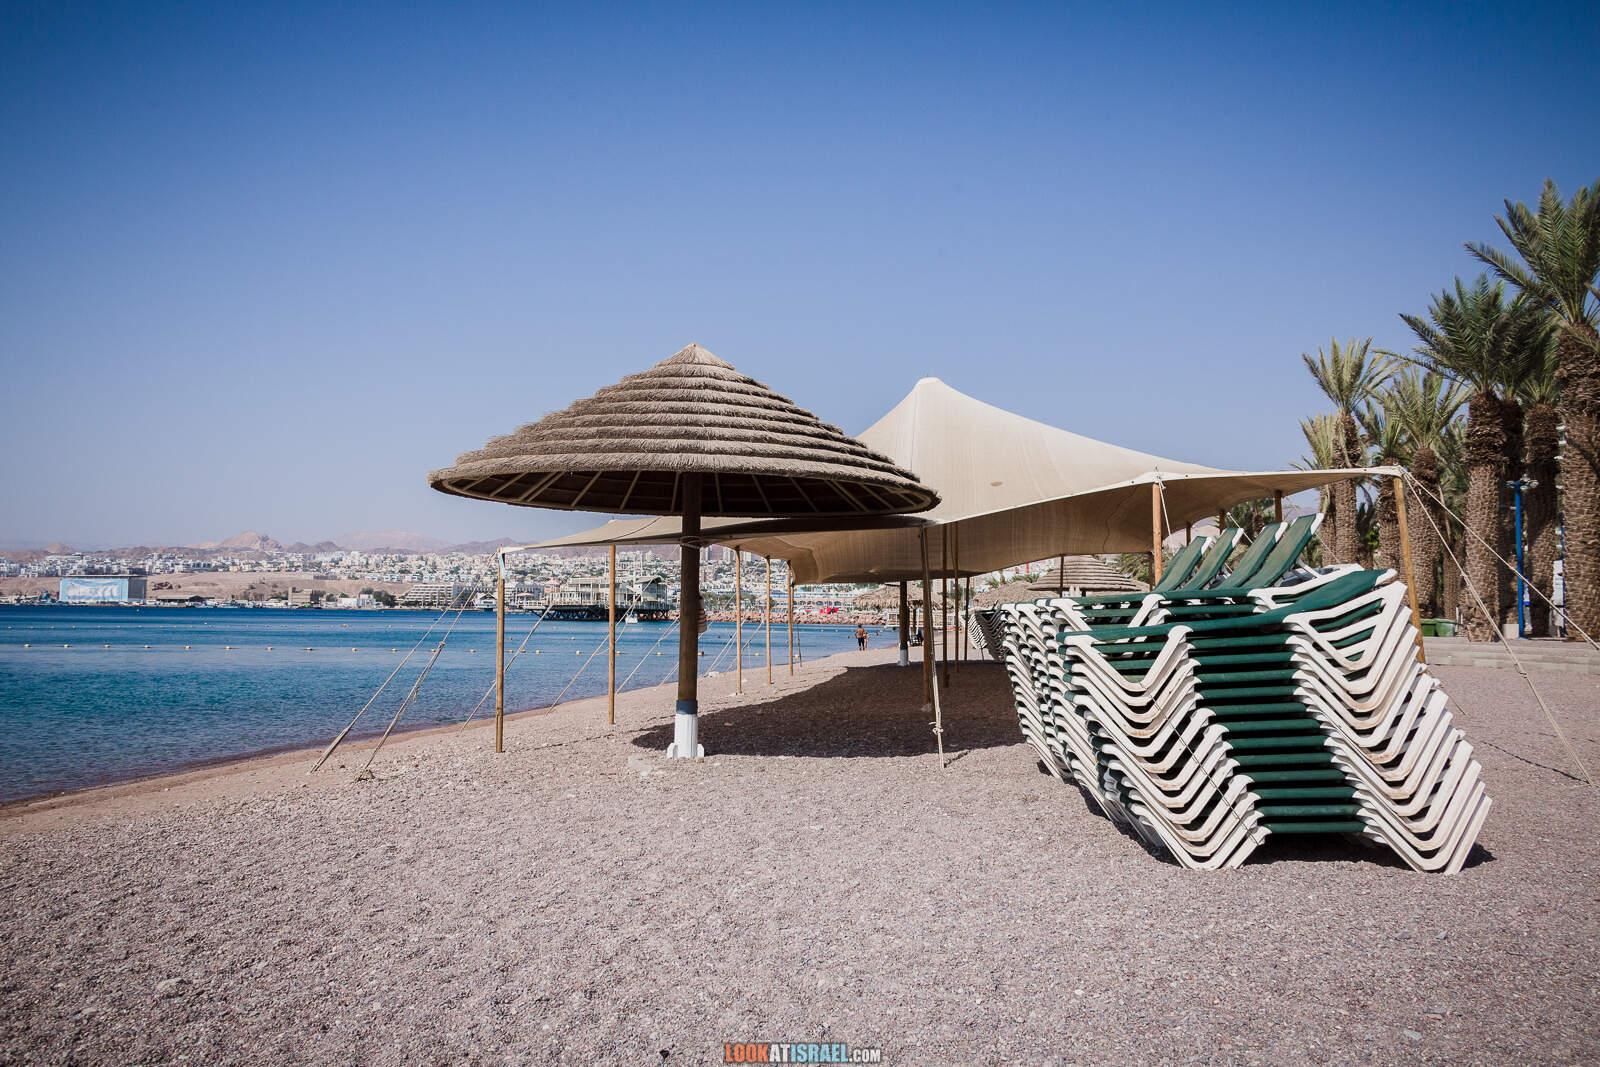 Карантин в Эйлате, пустой город | Lockdown in Eilat | סגר באילת